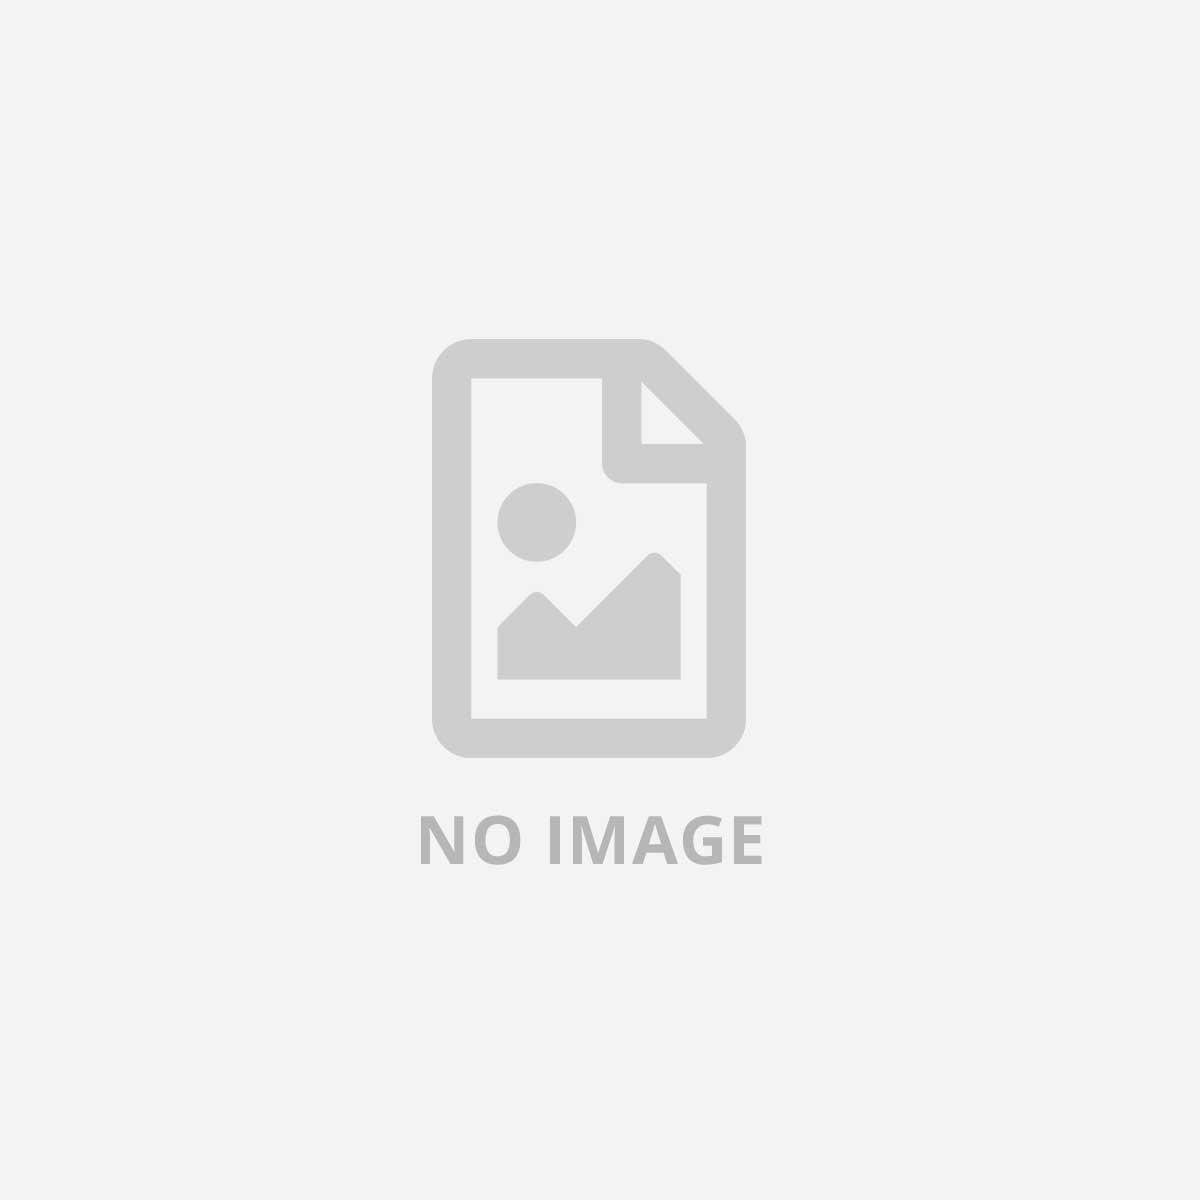 BROTHER CUSTODIA PER TRASPORTO X PJ